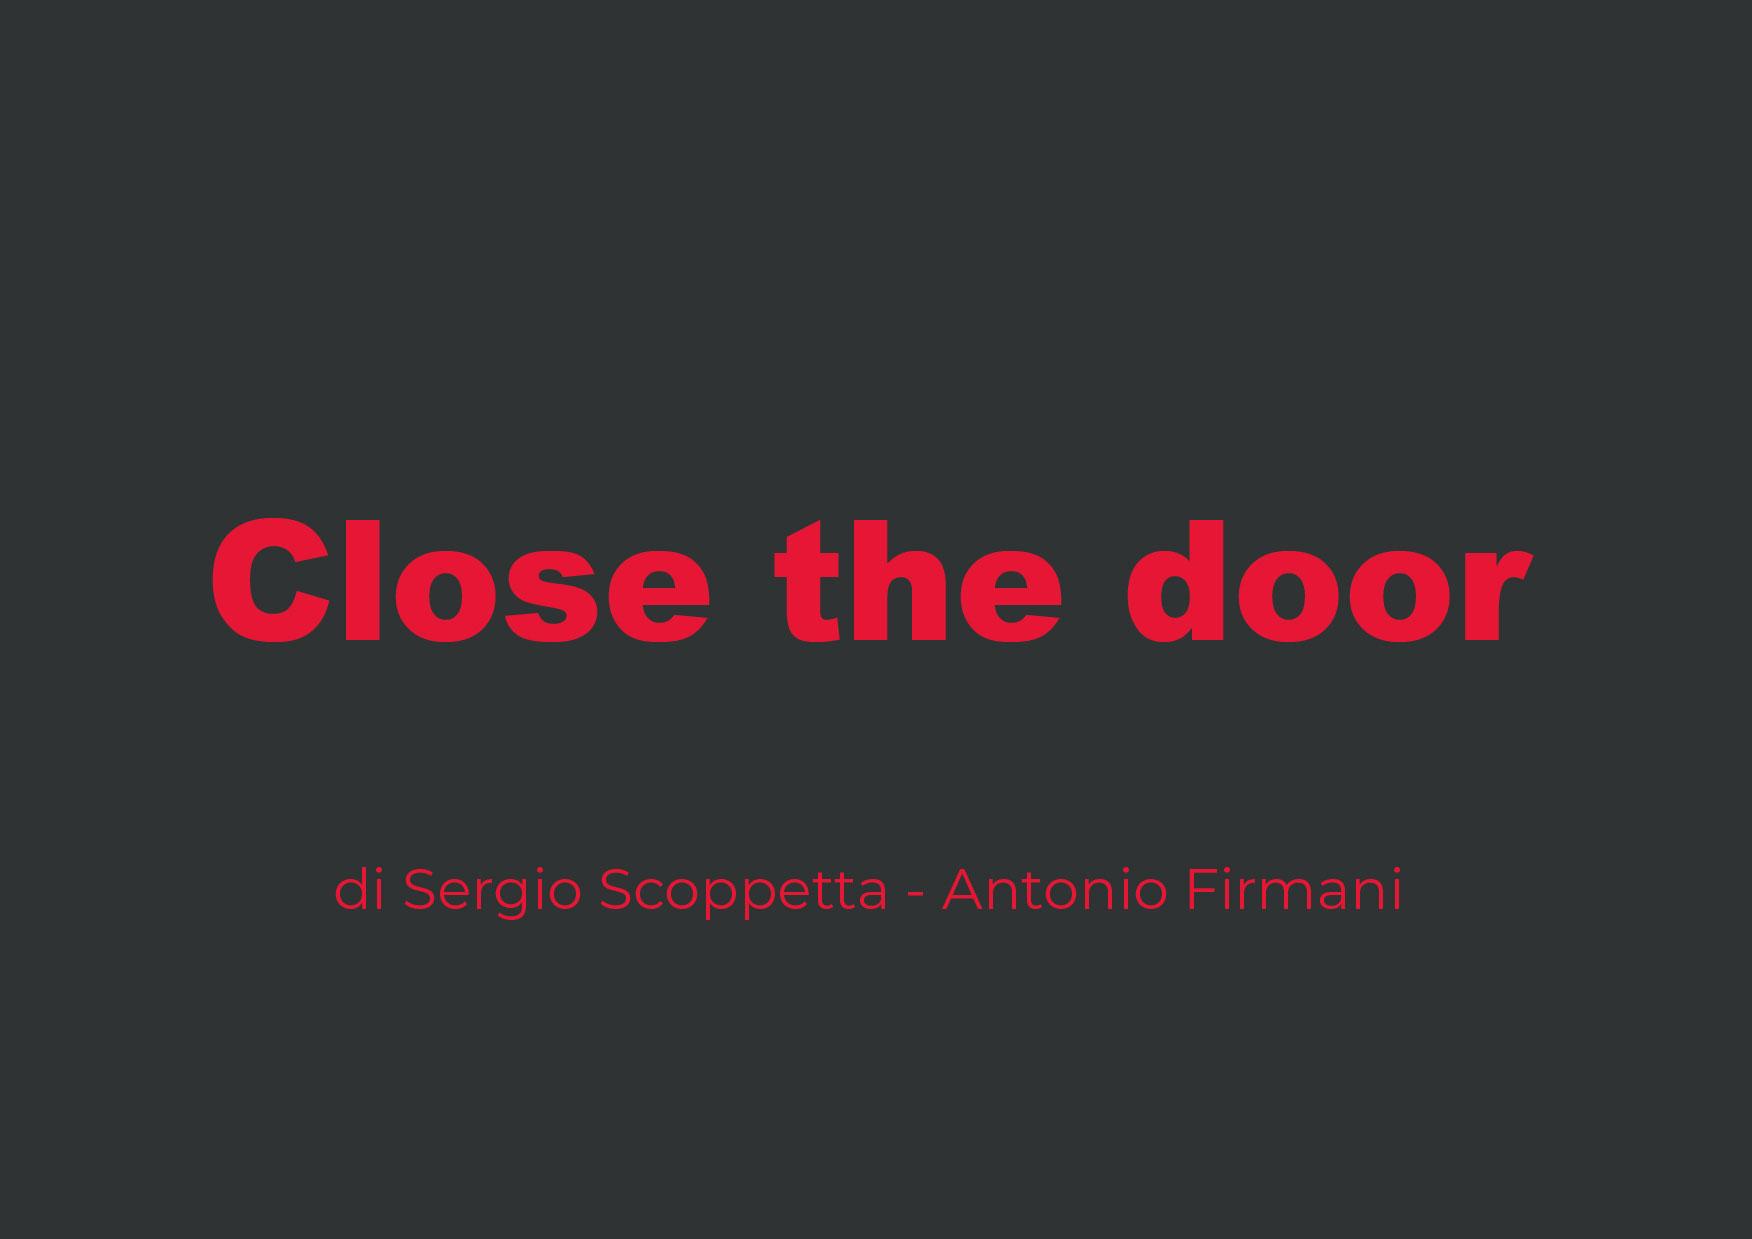 Close the door Progetti MR8 Productions